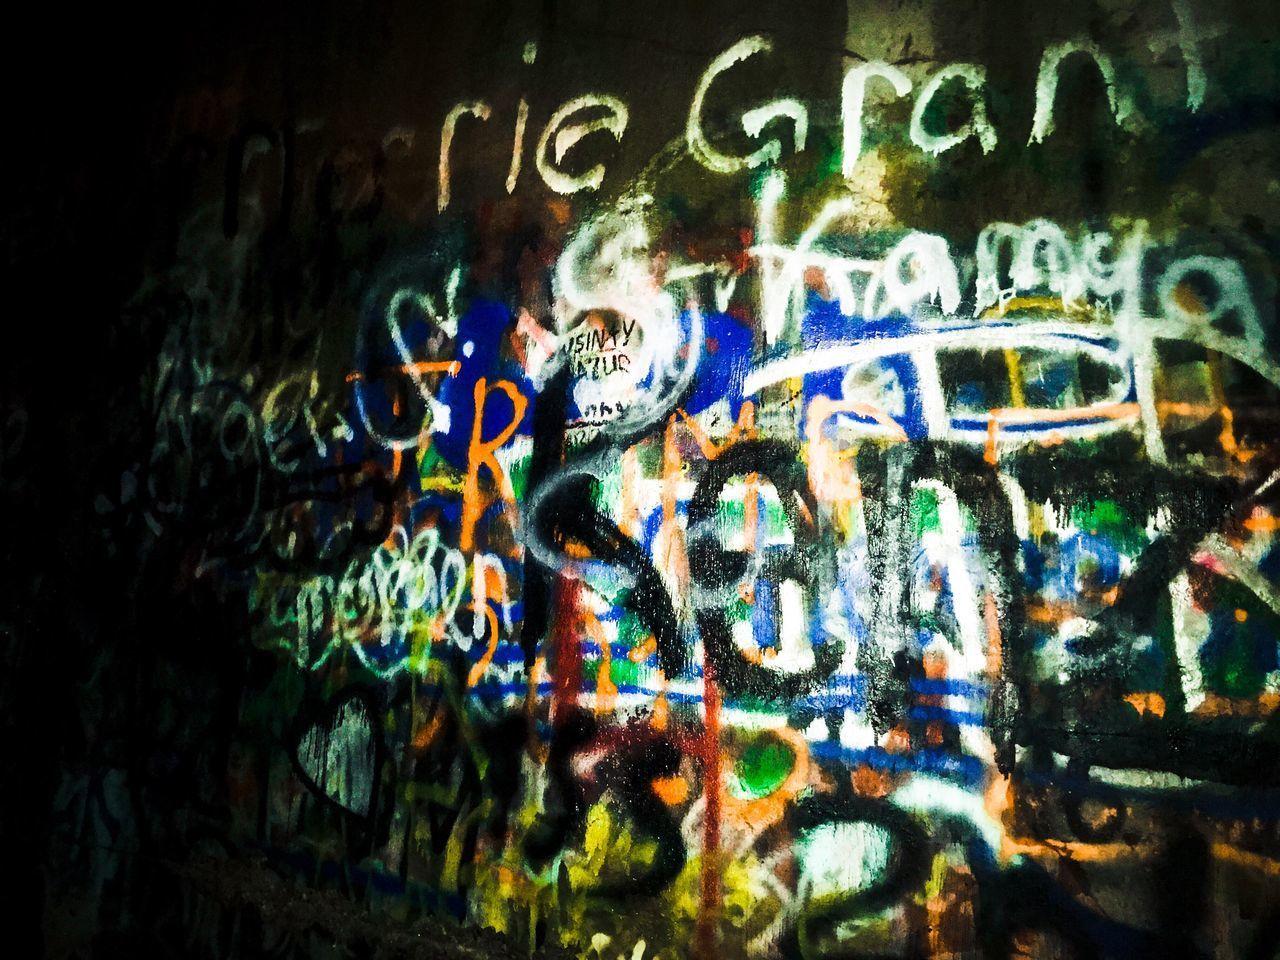 text, graffiti, illuminated, communication, no people, night, close-up, multi colored, architecture, outdoors